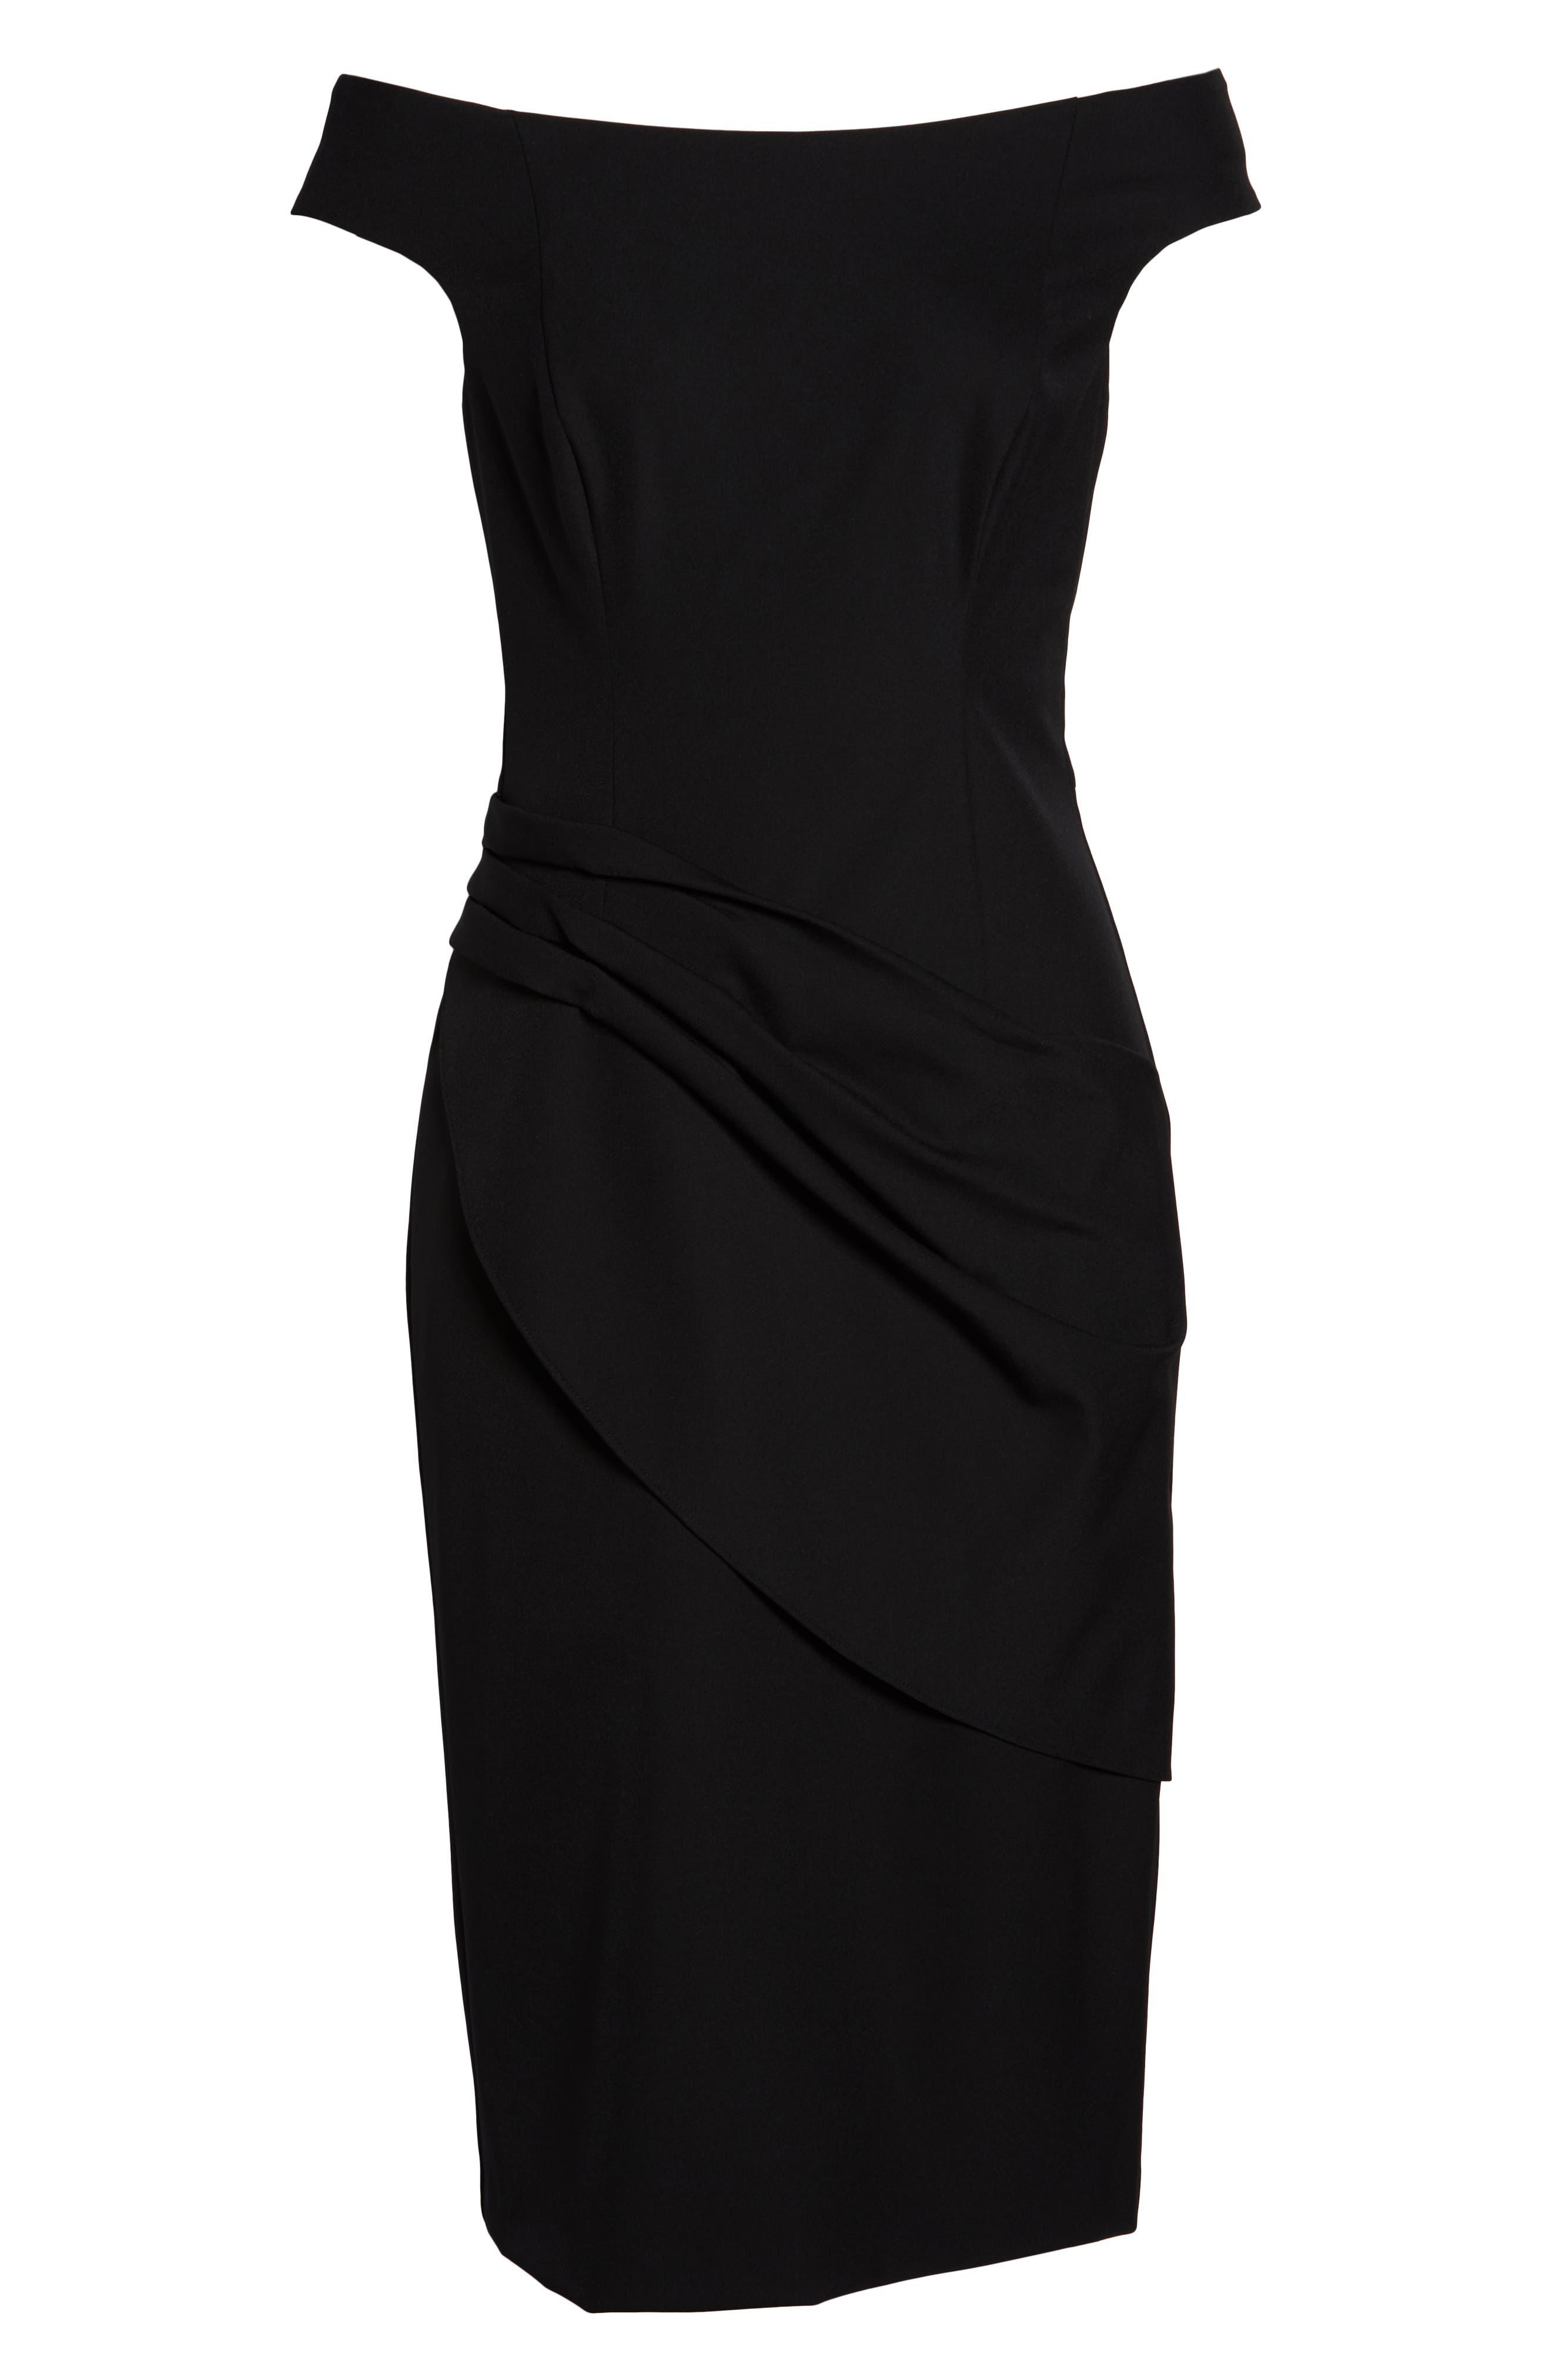 ELIZA J, Off the Shoulder Sheath Dress, Alternate thumbnail 8, color, BLACK